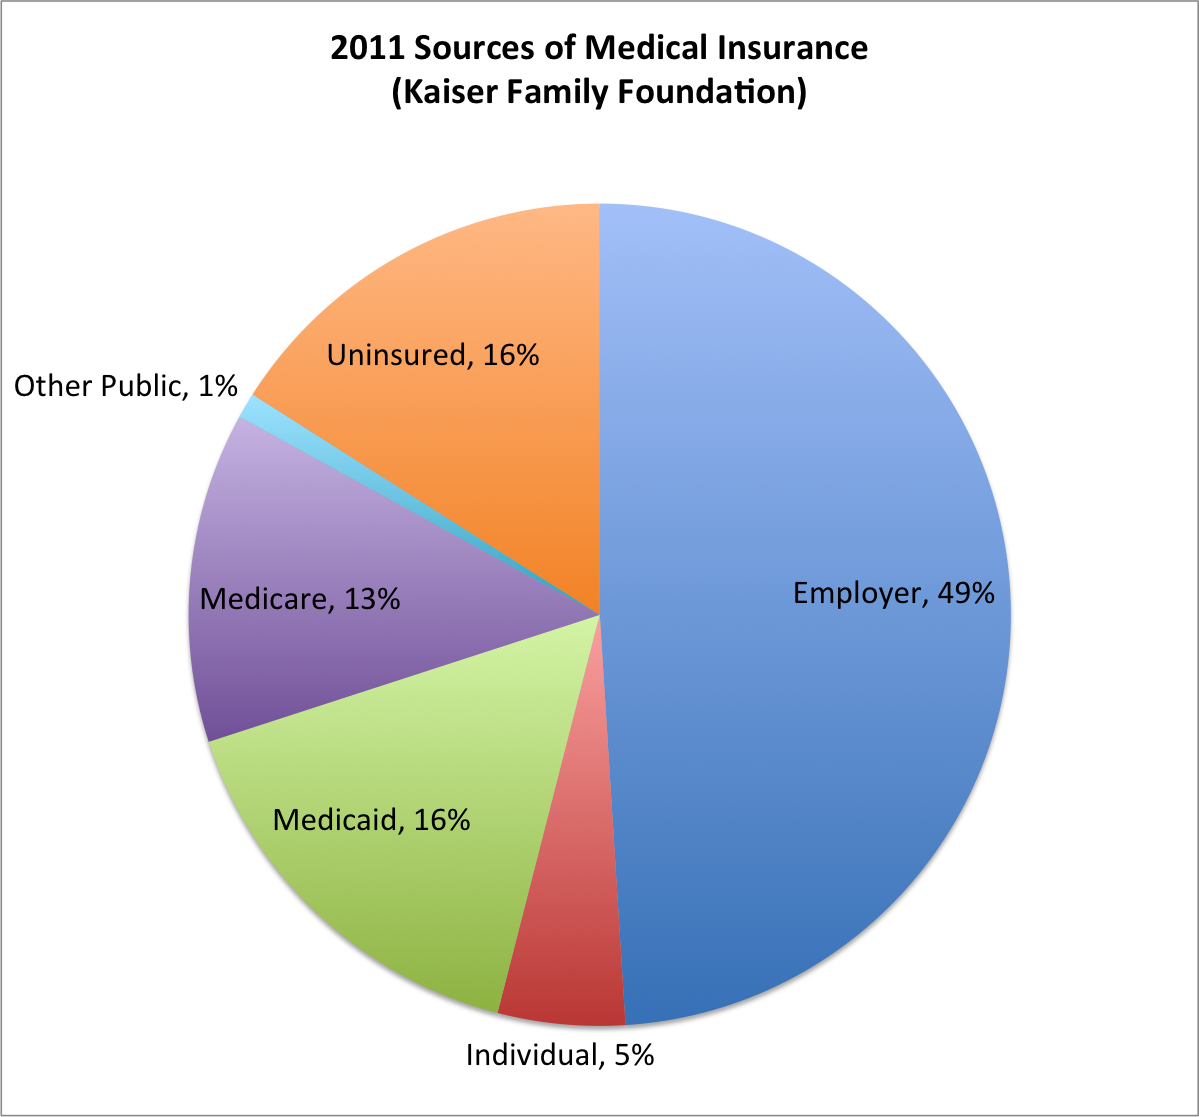 united states health care statistics memes - Google Search